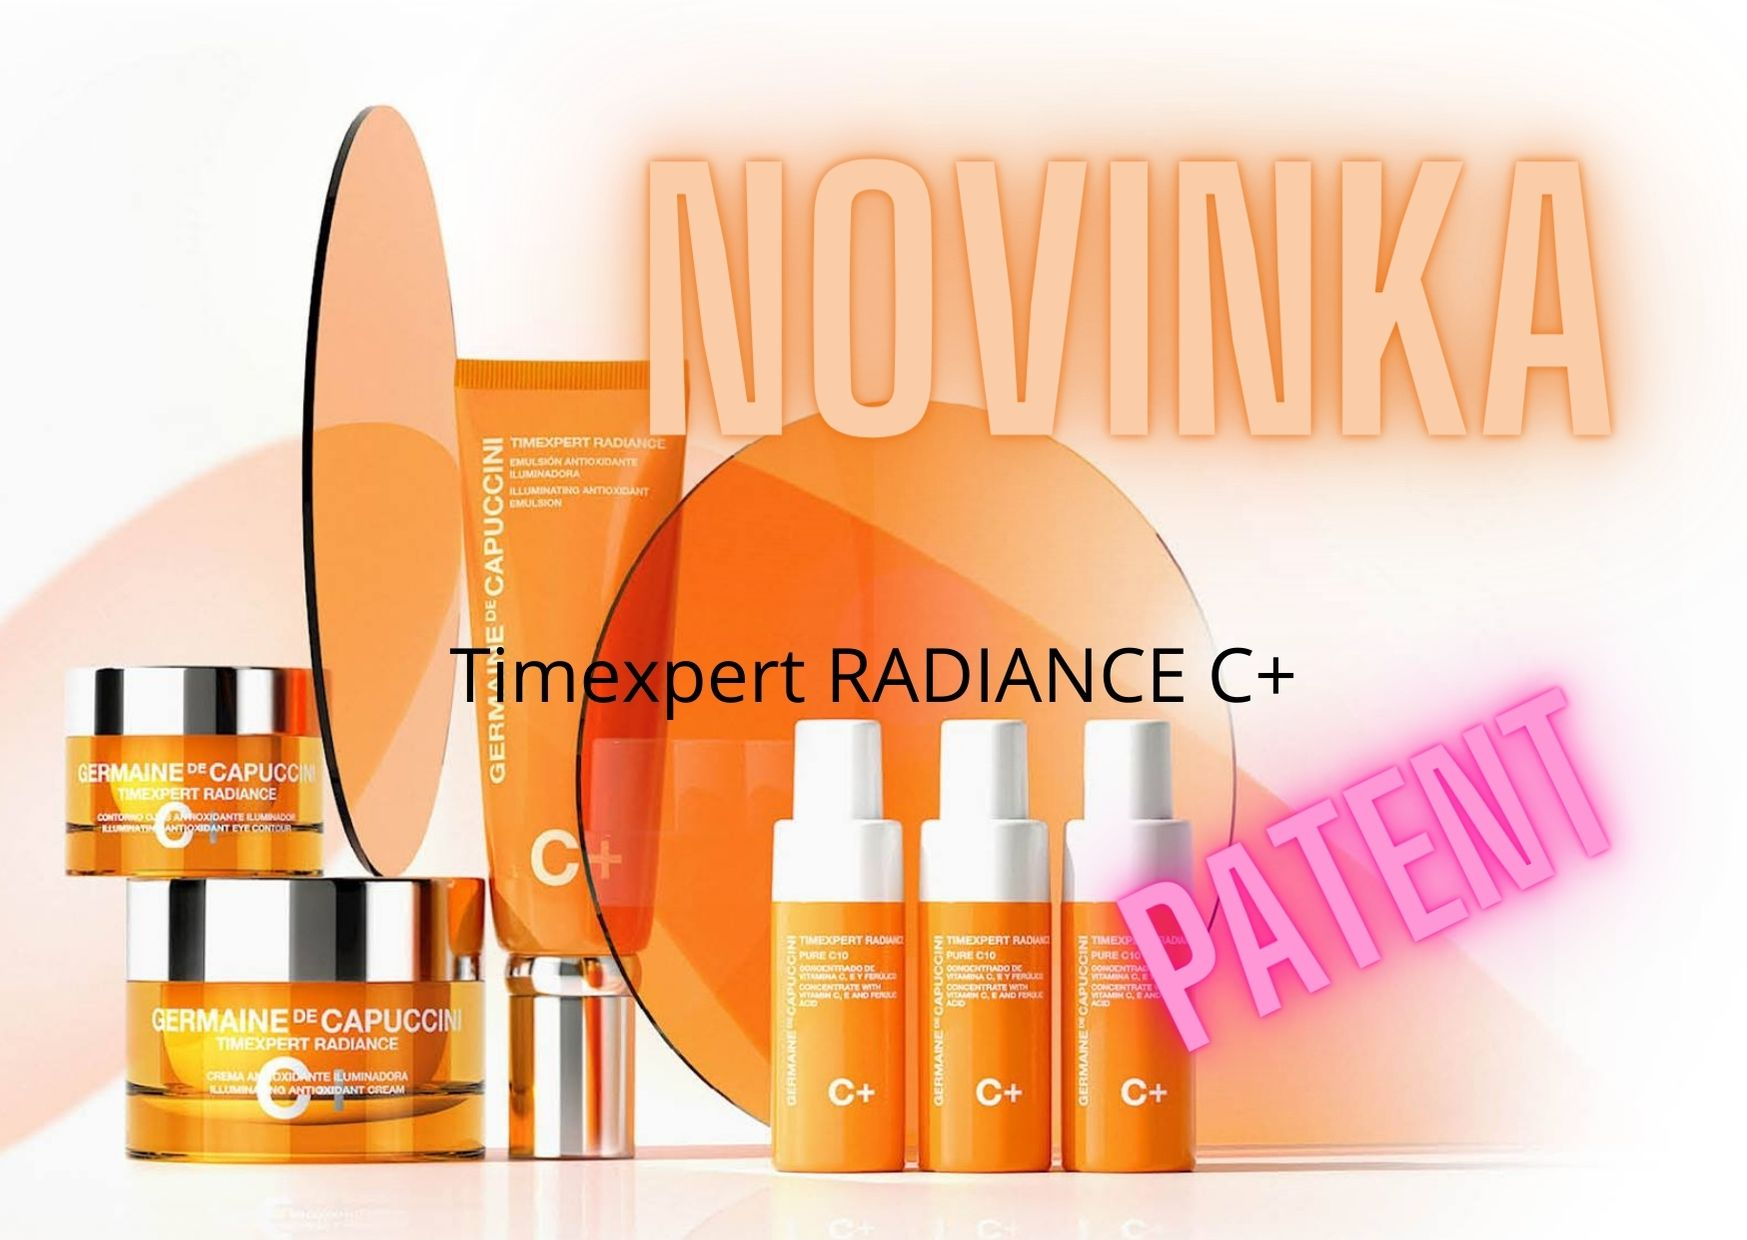 Timexpert Radiance C+